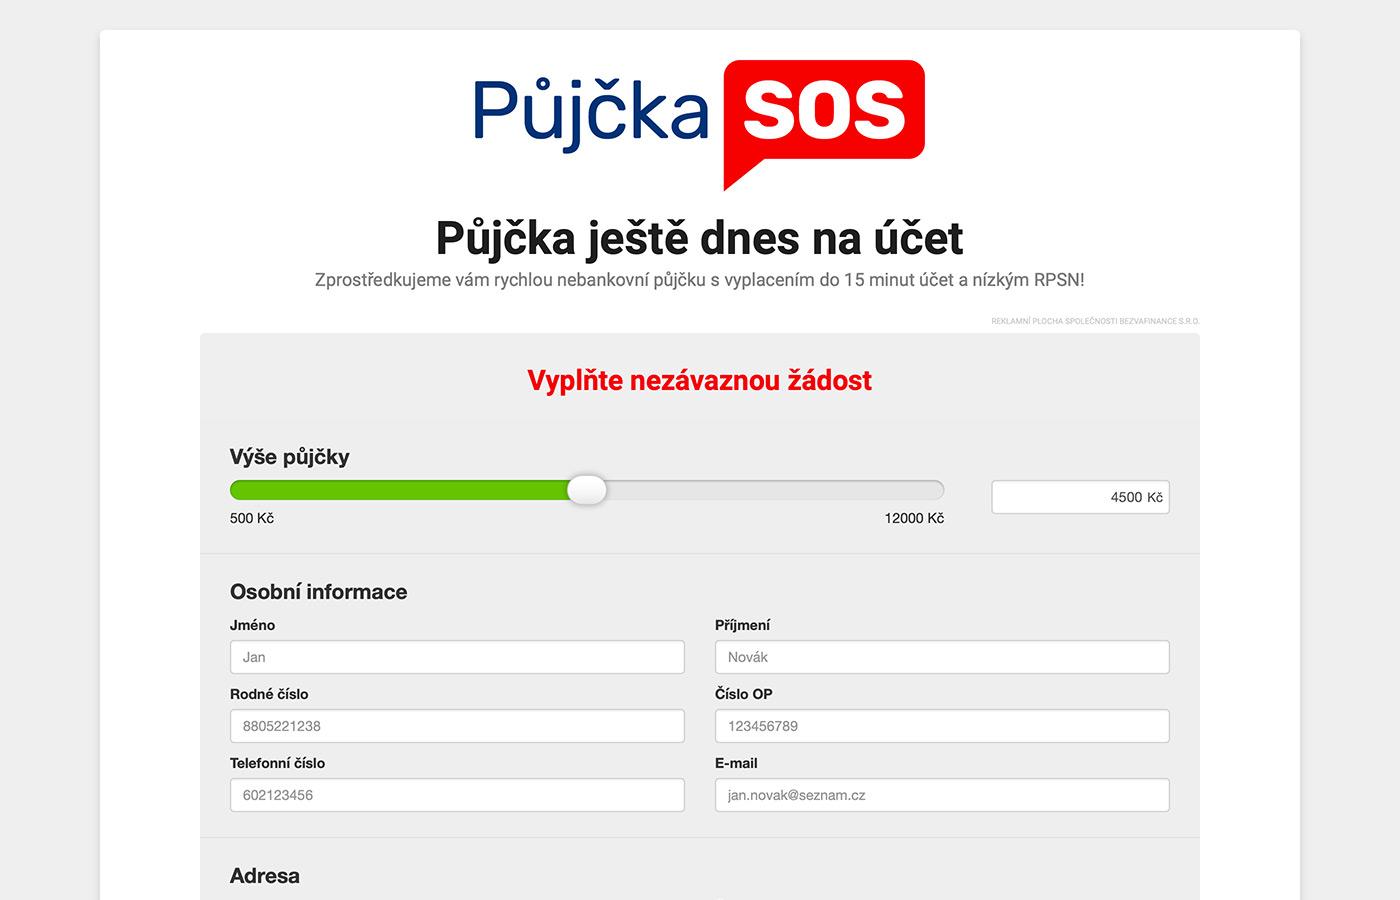 Náhled webu https://www.pujckasos.cz